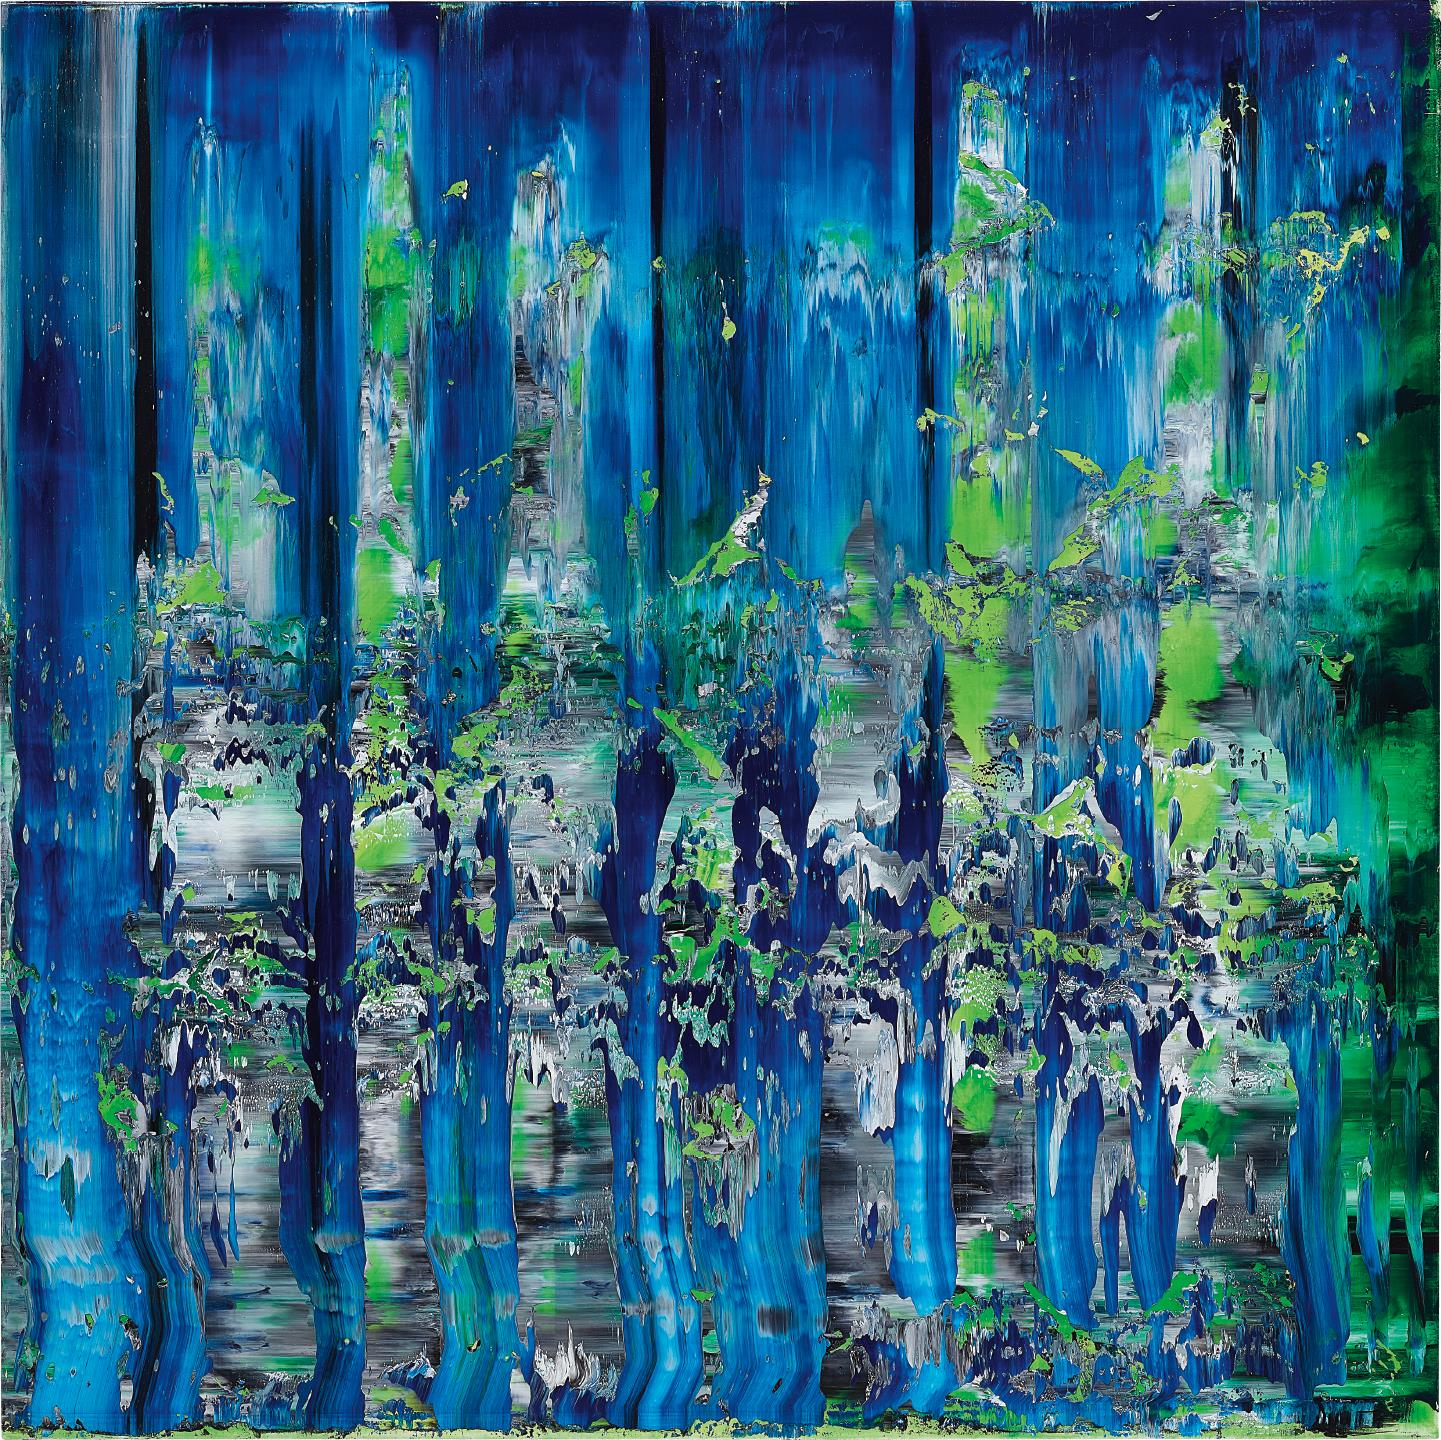 Stanley Casselman-Luminor-4-35-2015